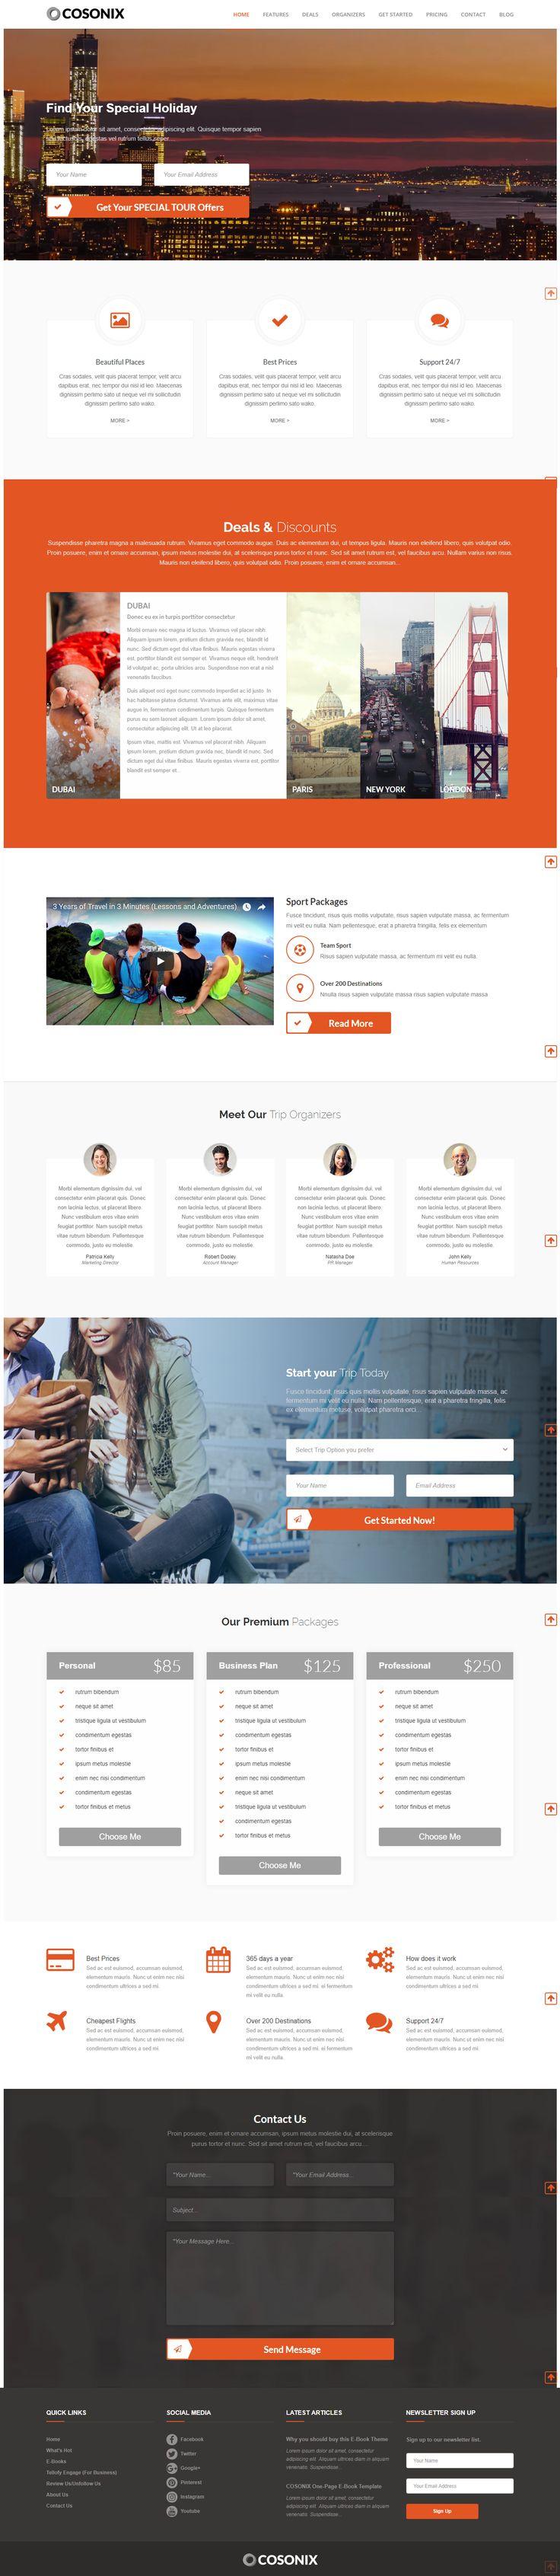 Cosonix Travel is a Multipurpose WordPress